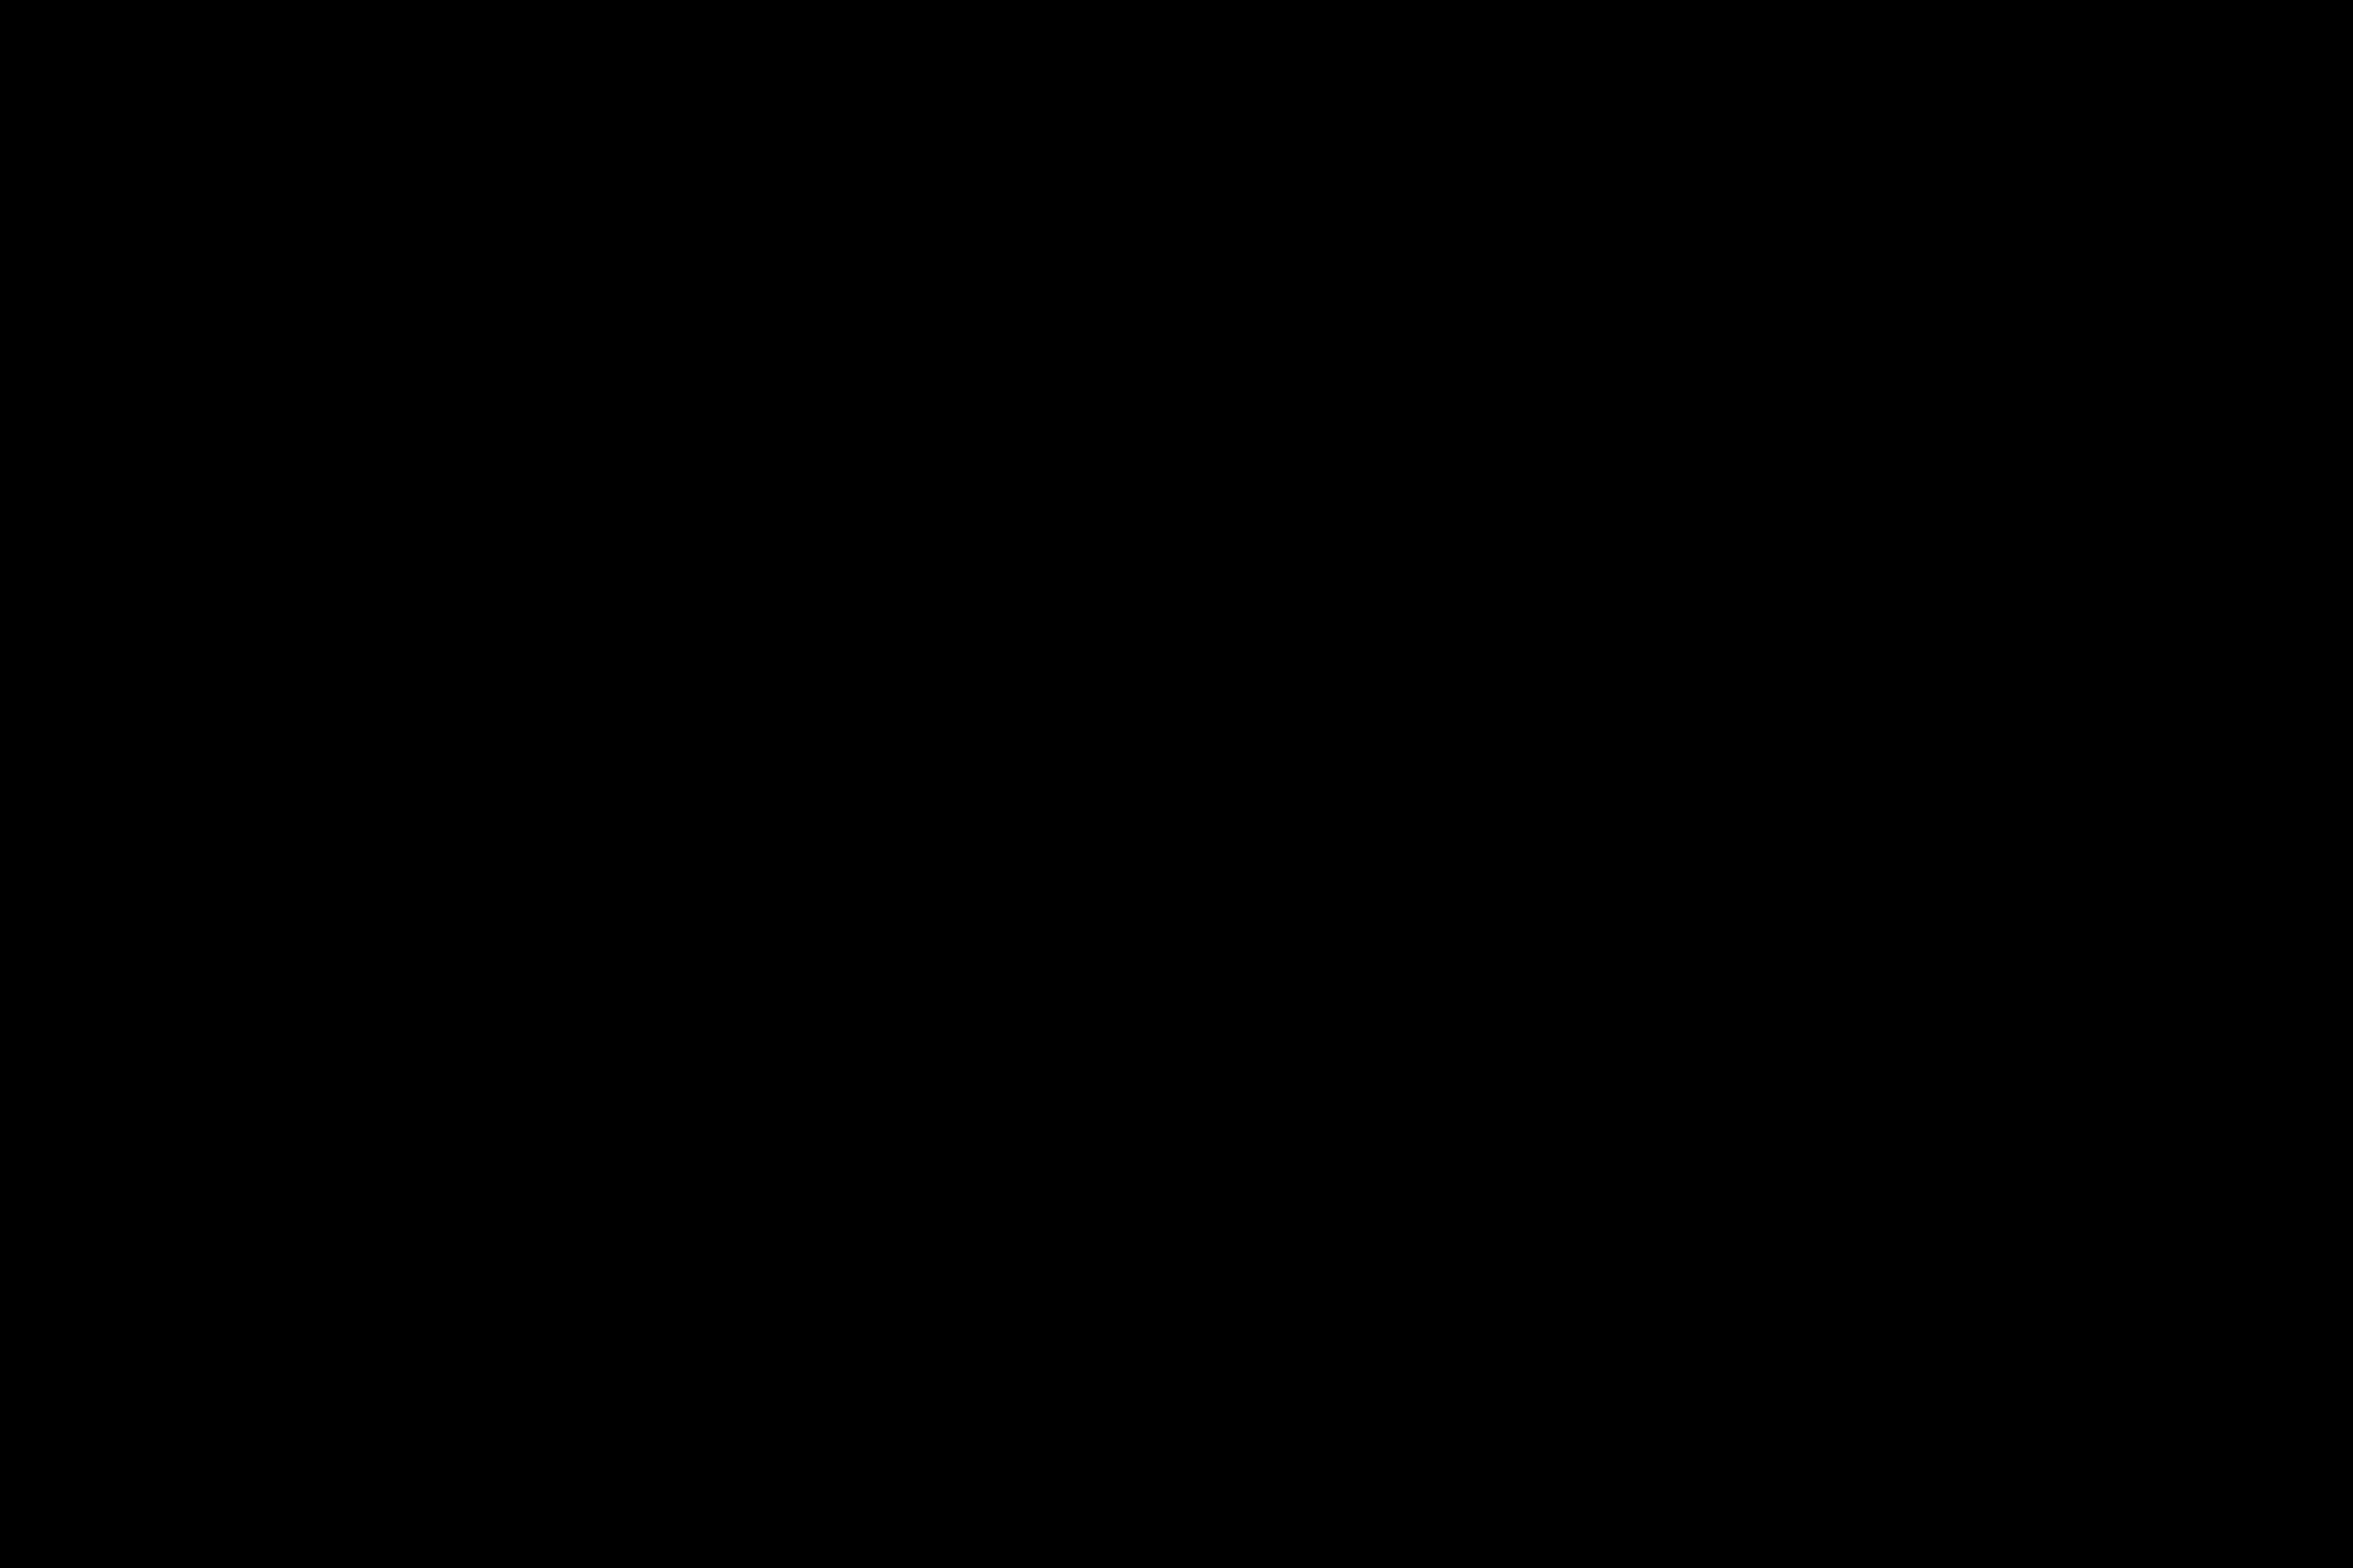 Escultor